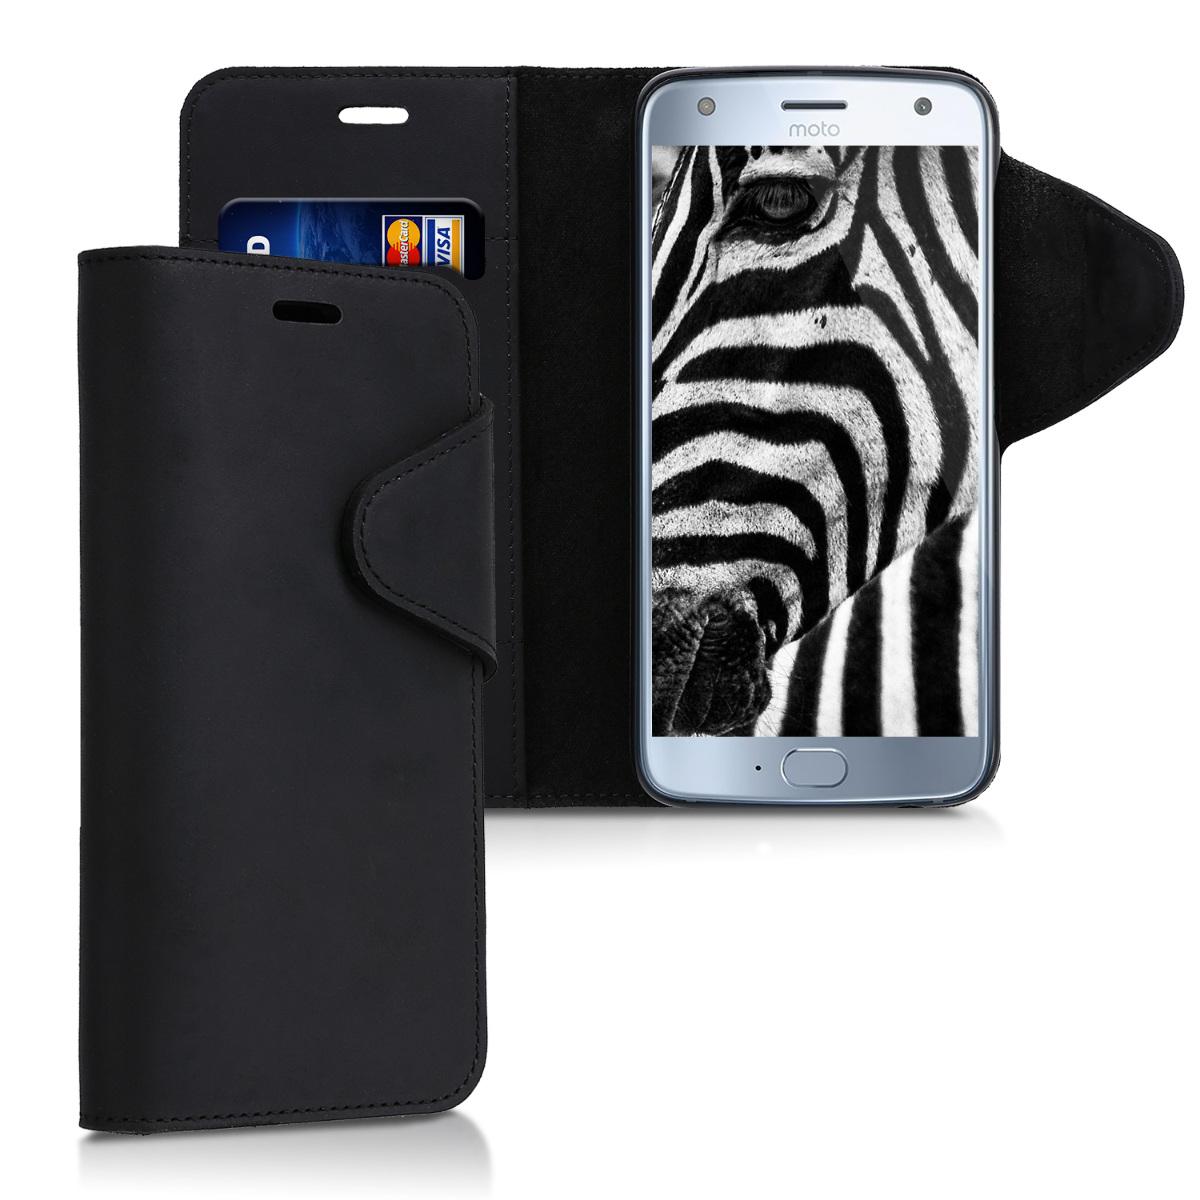 Kalibri Δερμάτινη Suede Θήκη - Πορτοφόλι Motorola Moto X4 - Μαύρο (43098.01)